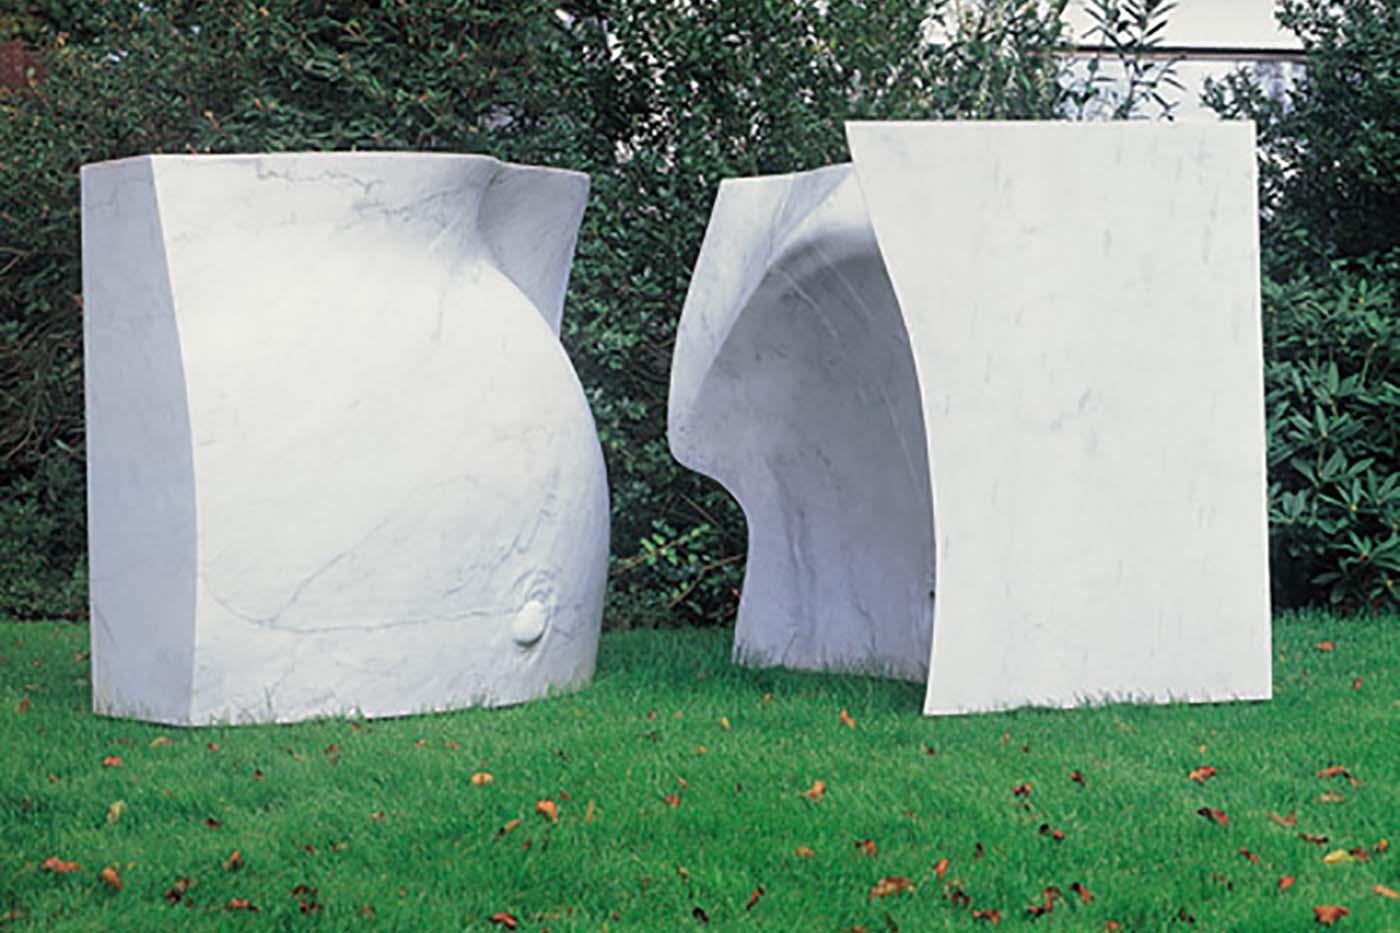 10_Grosser Wuerfel, Bianco Carrara [2000]